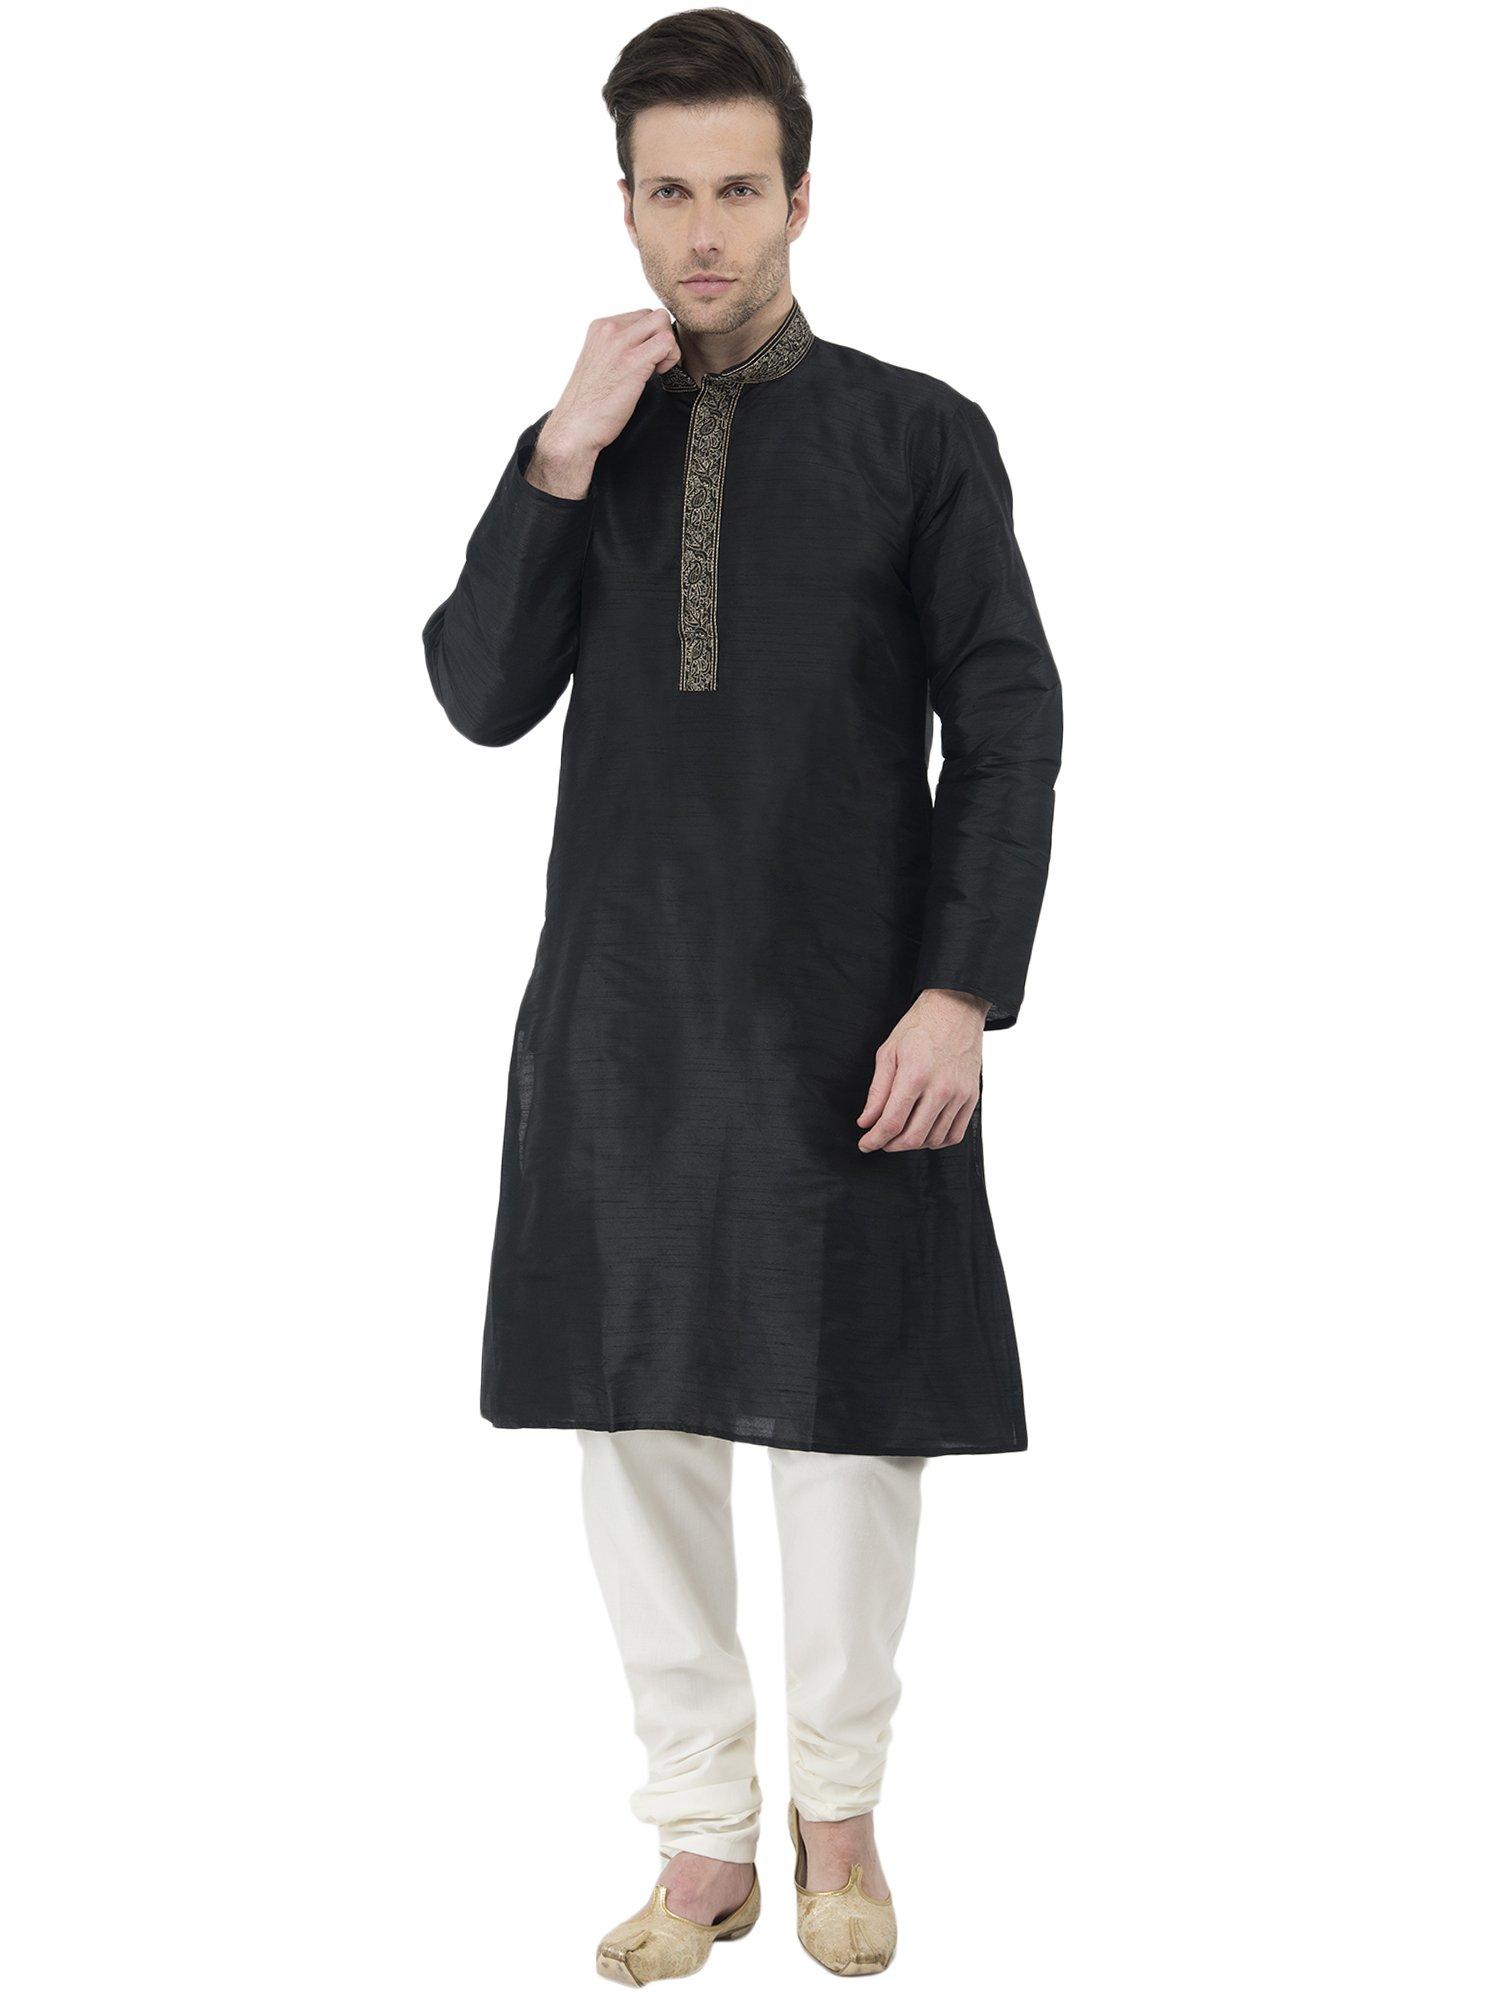 Mens Black Kurta Pajama Long Sleeve Button Down Shirt Indian Clothing Fashion Ethnic Dress -L